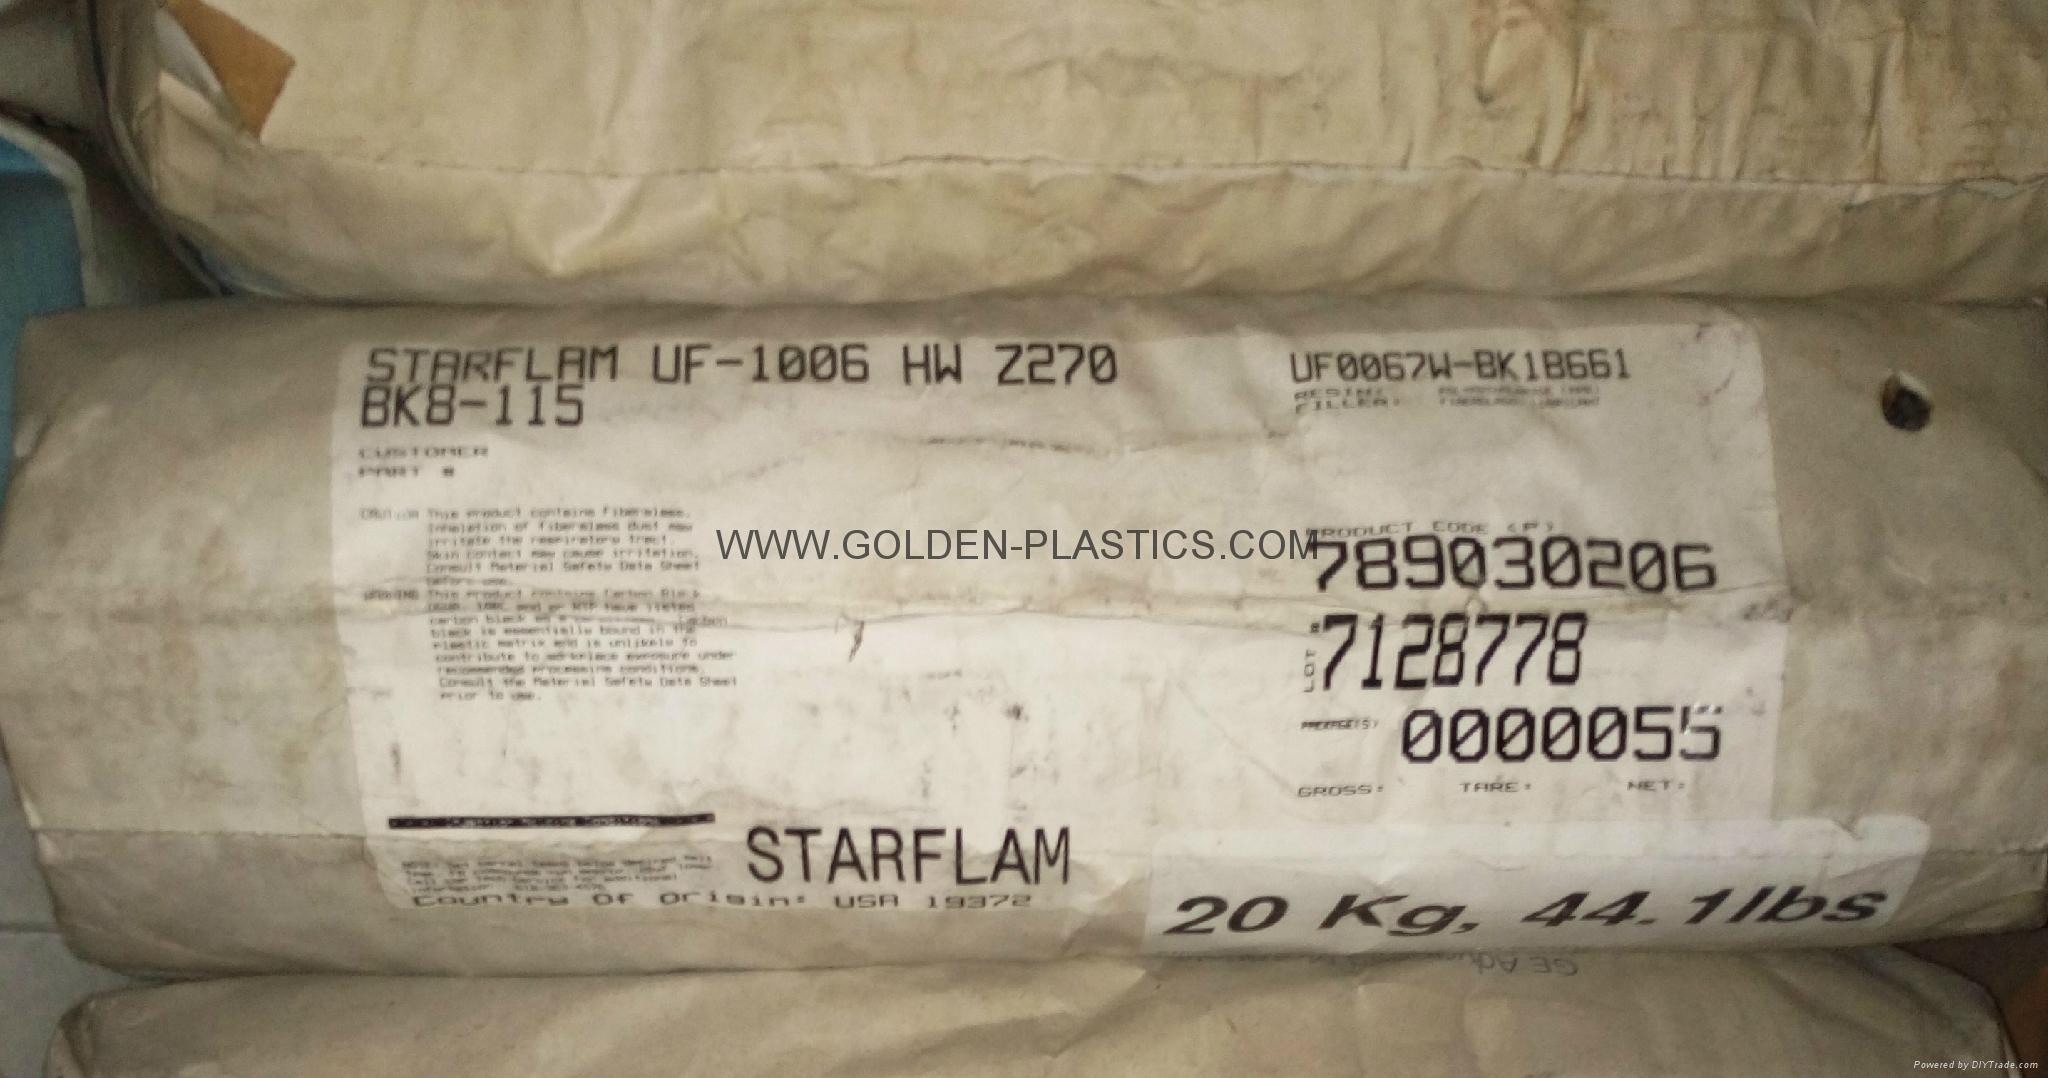 STARFLAM UF-1006HW